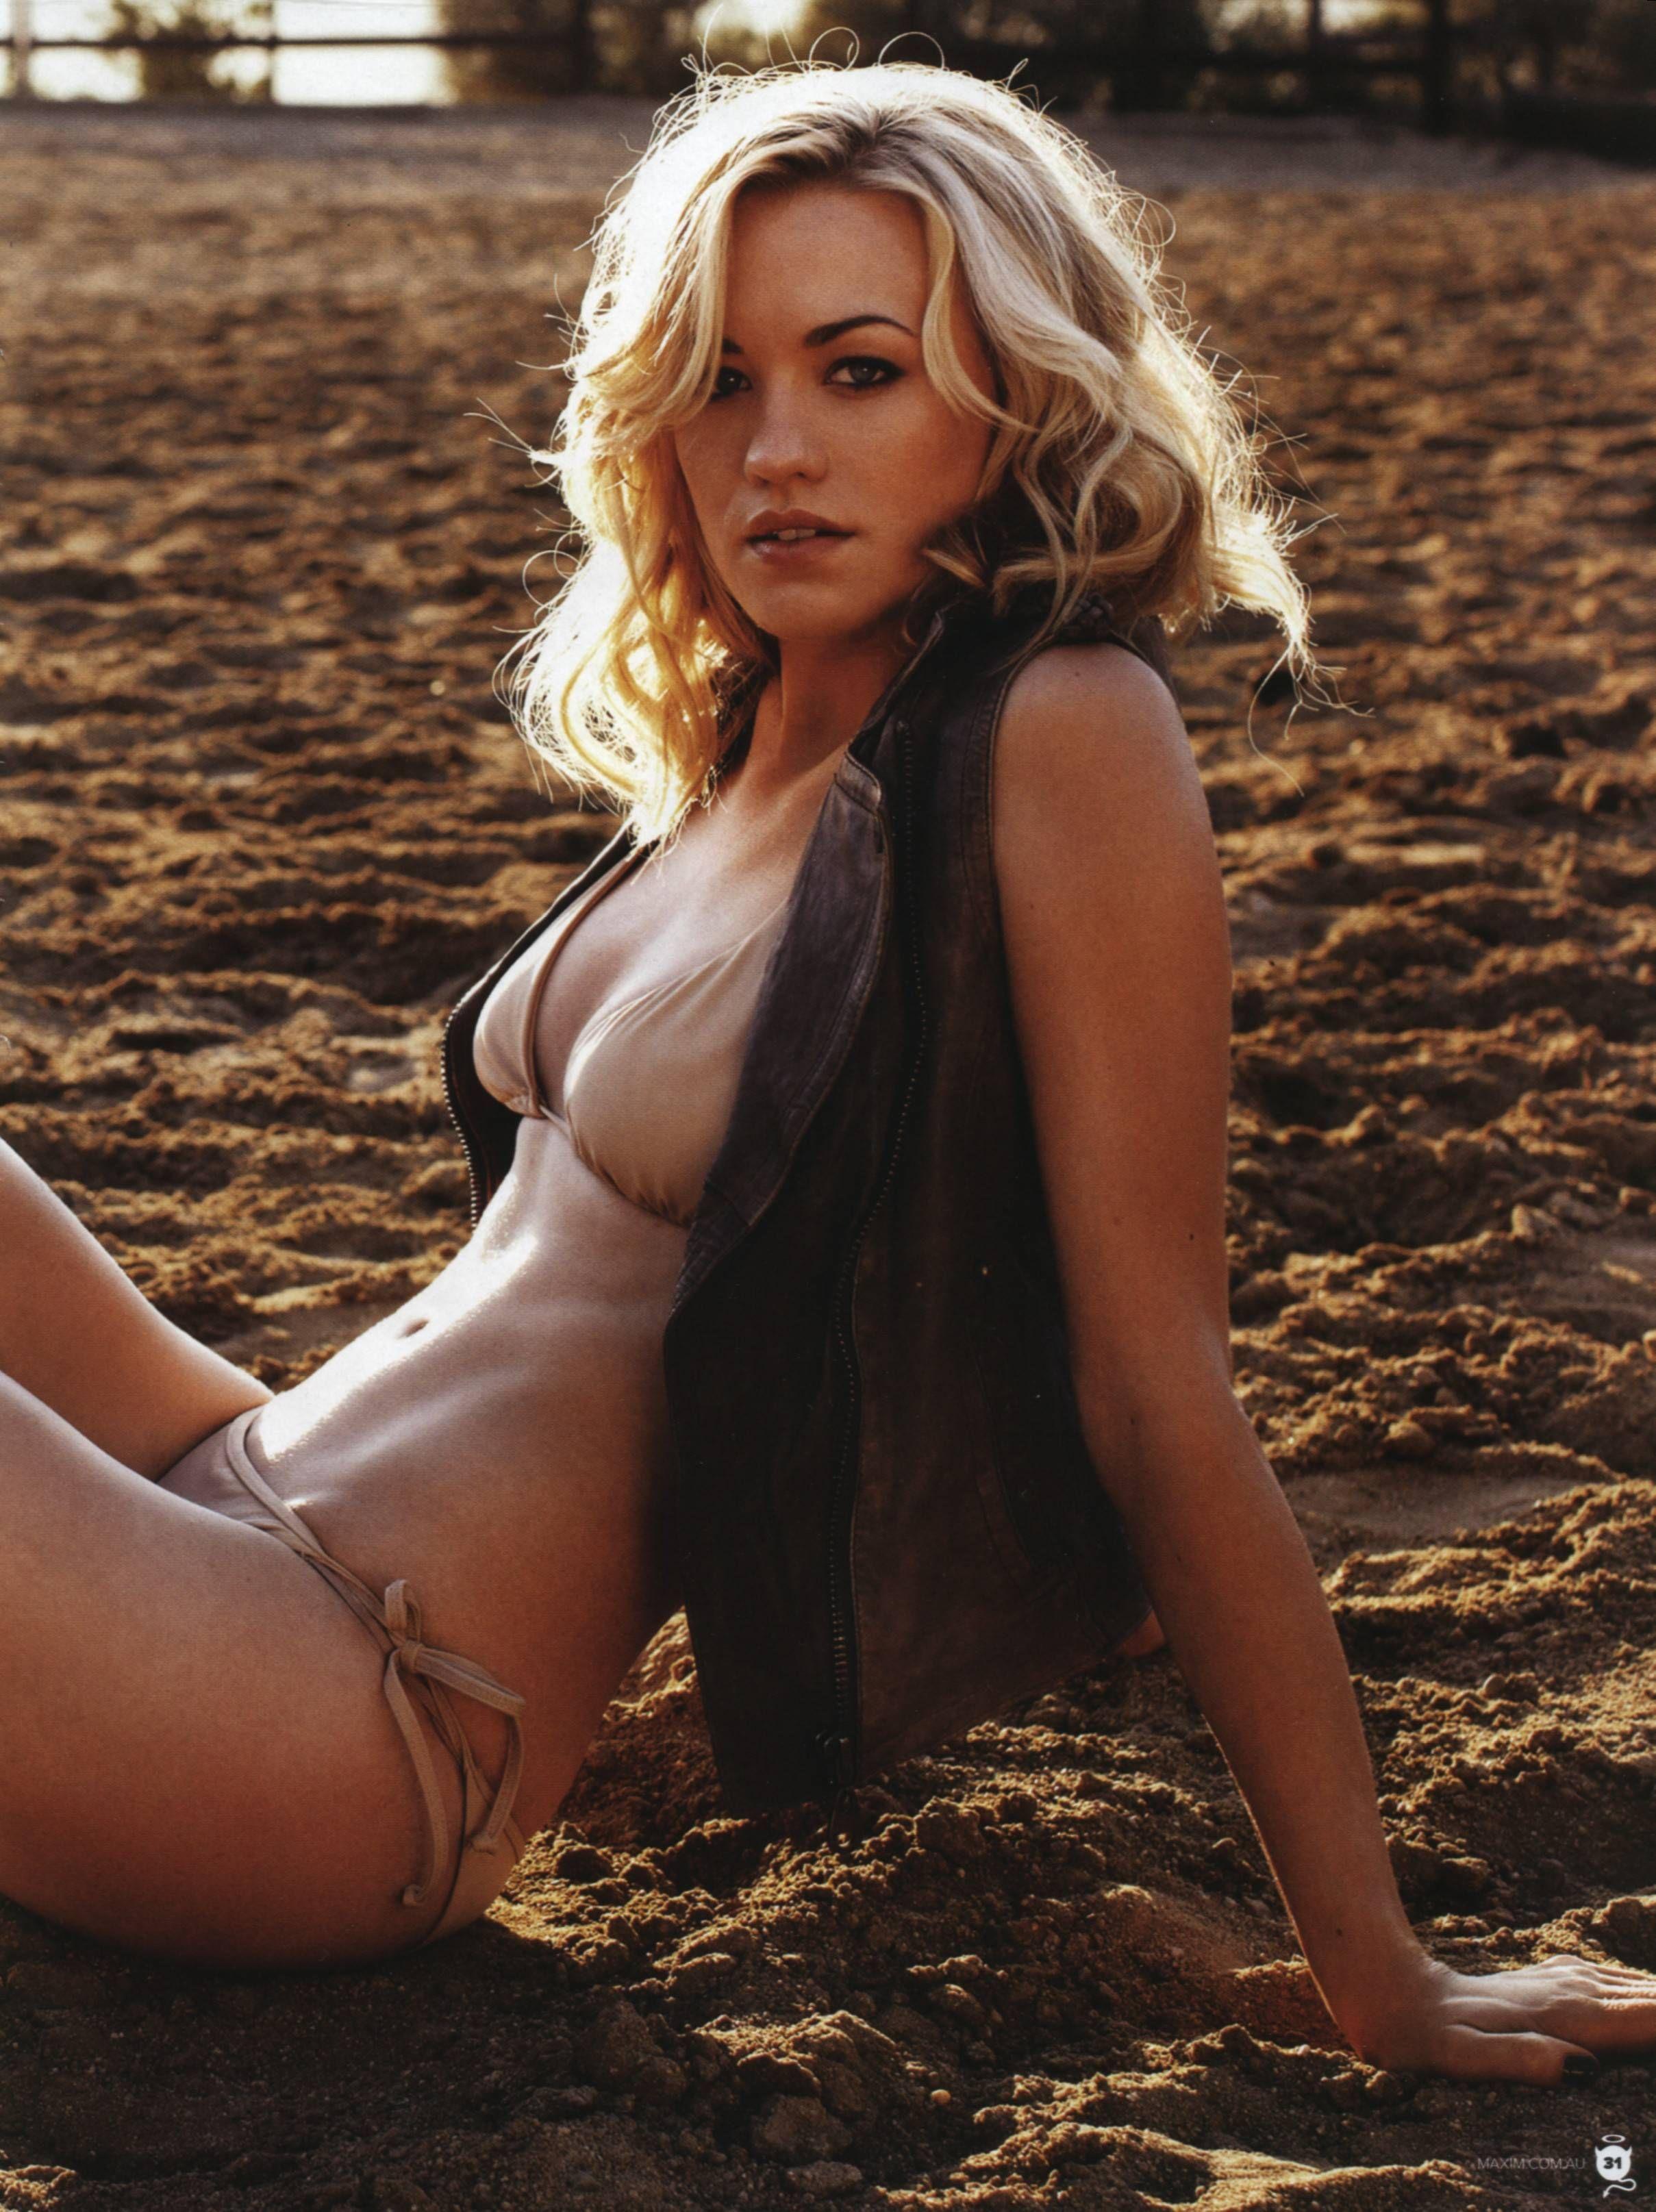 Yvonne stravinsky nude Nude Photos 95